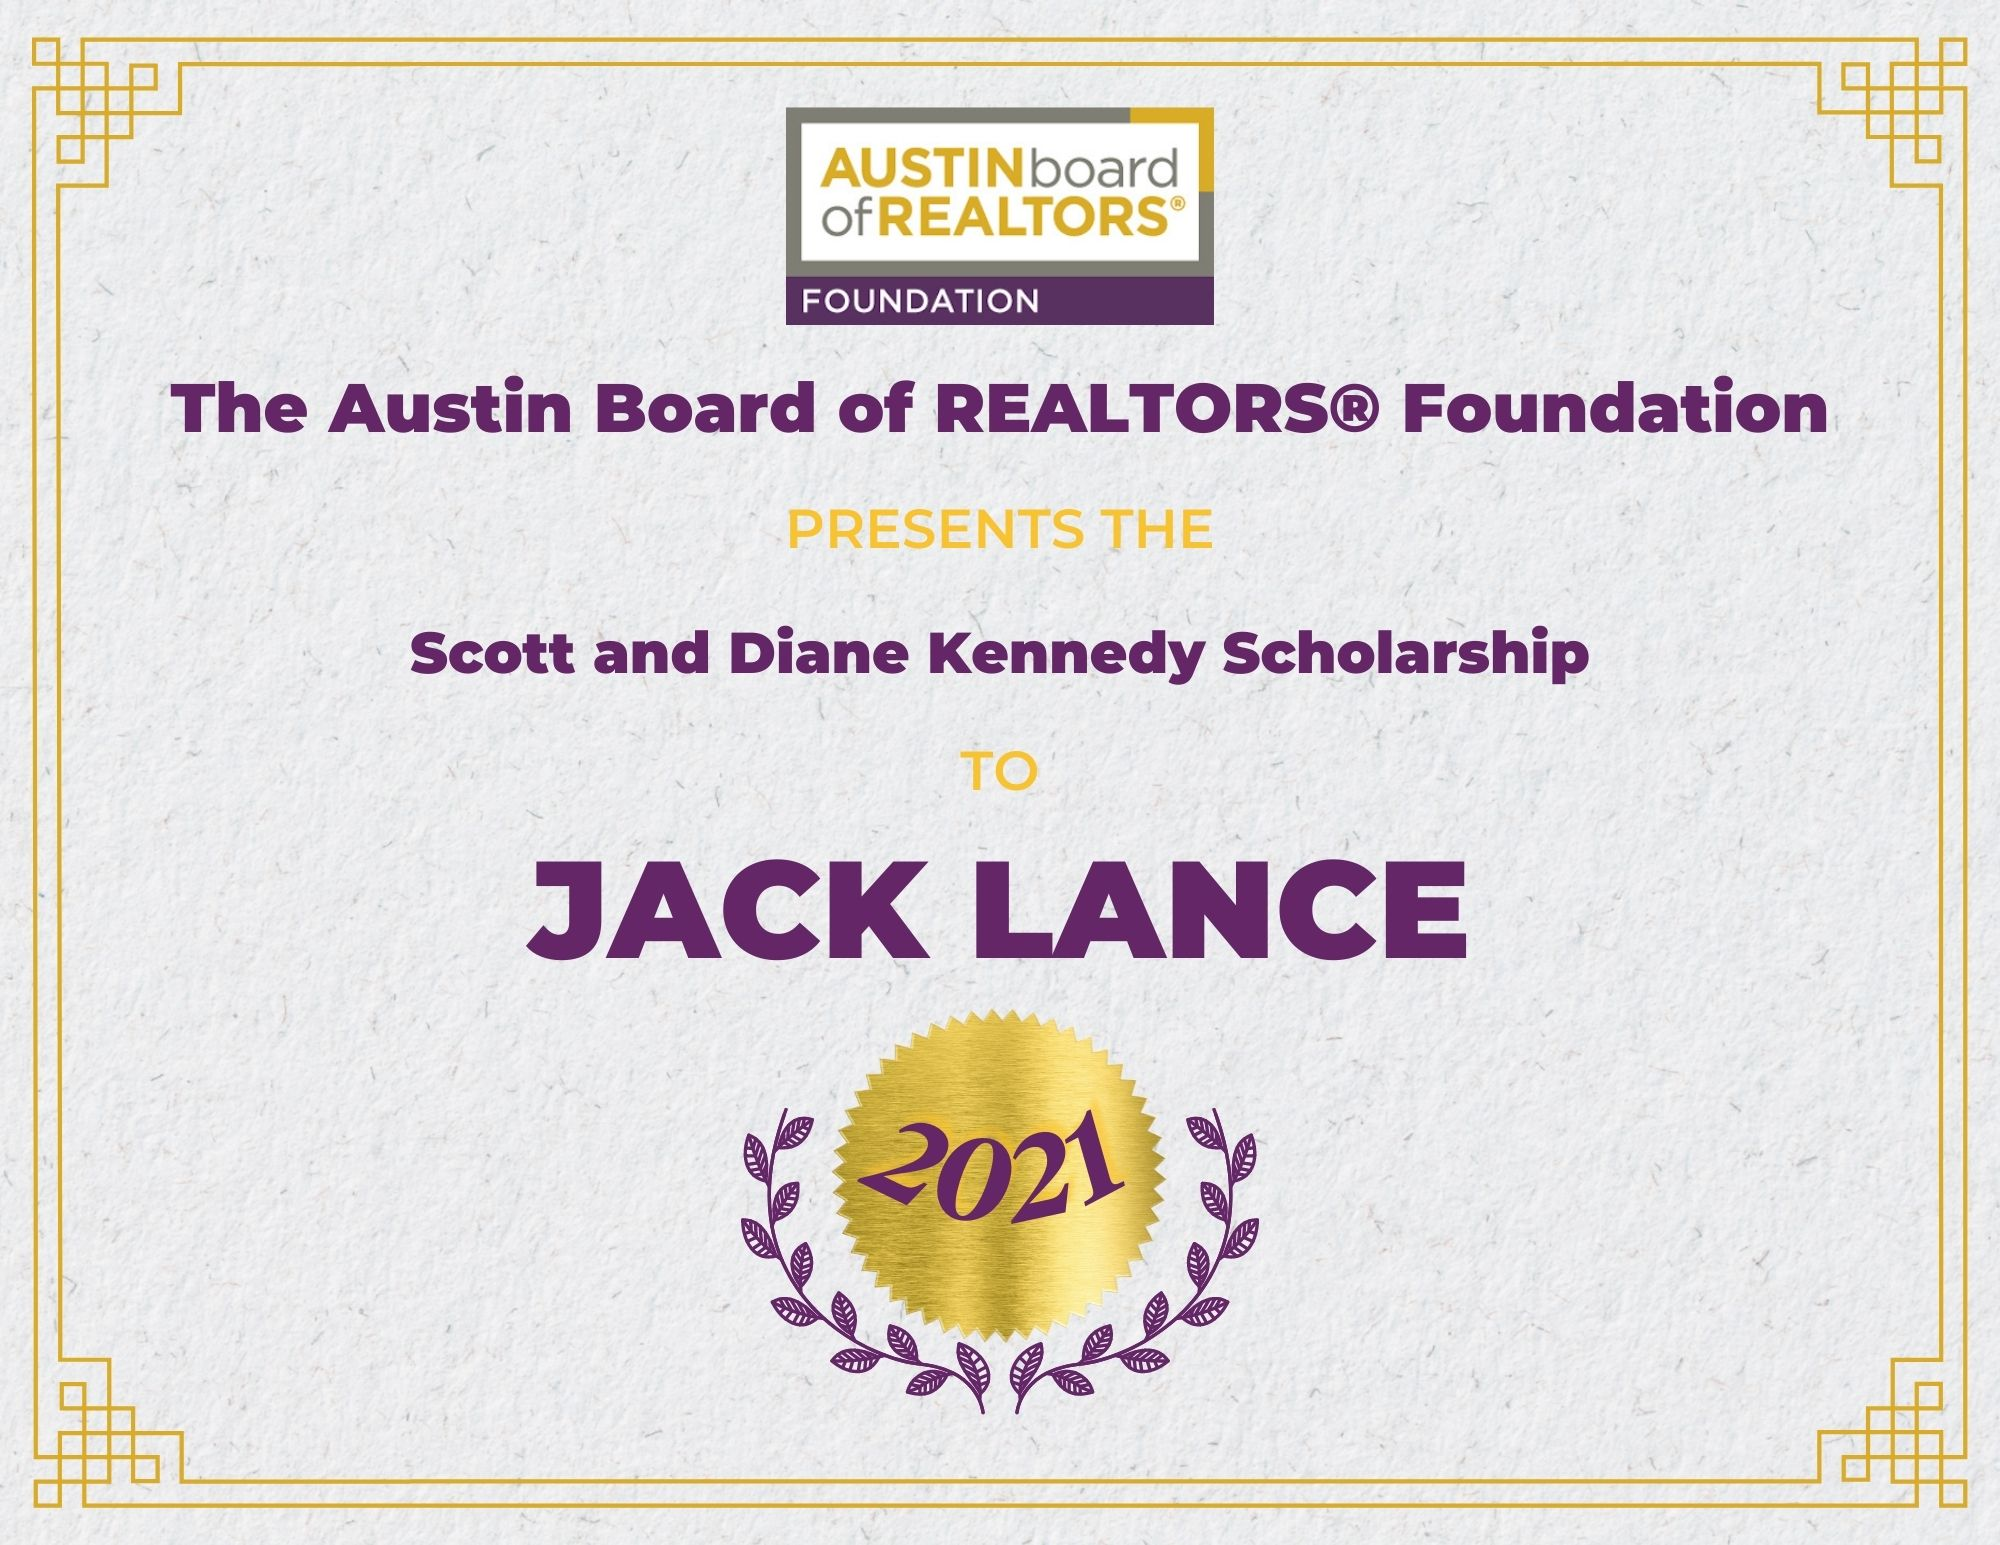 2021 Fou Scholarship Certificate Jacklance